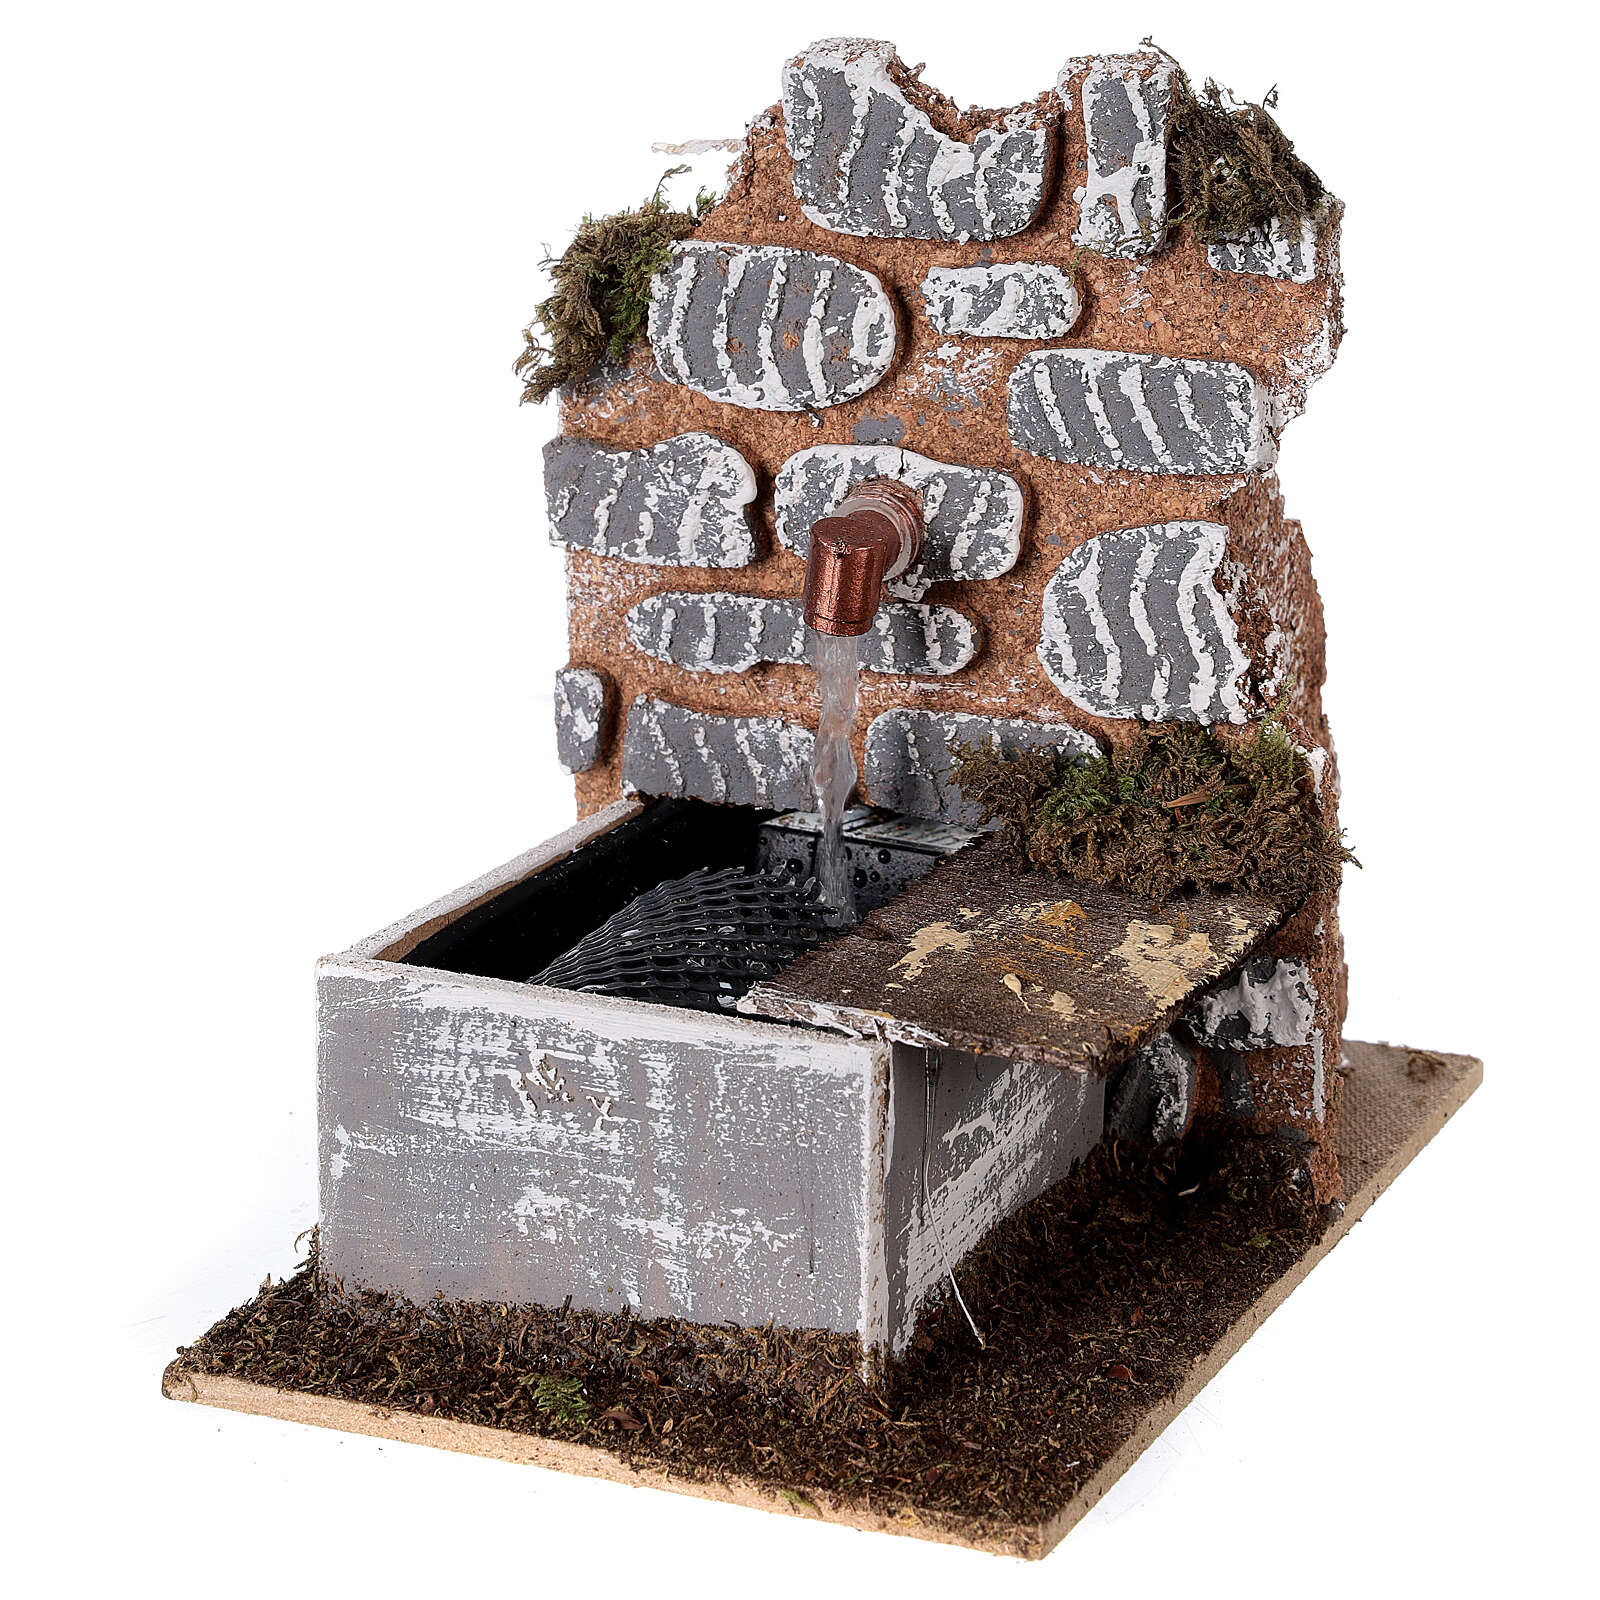 Fontana con pompa 15x10x15 cm miniatura presepe - 10-12 cm 4